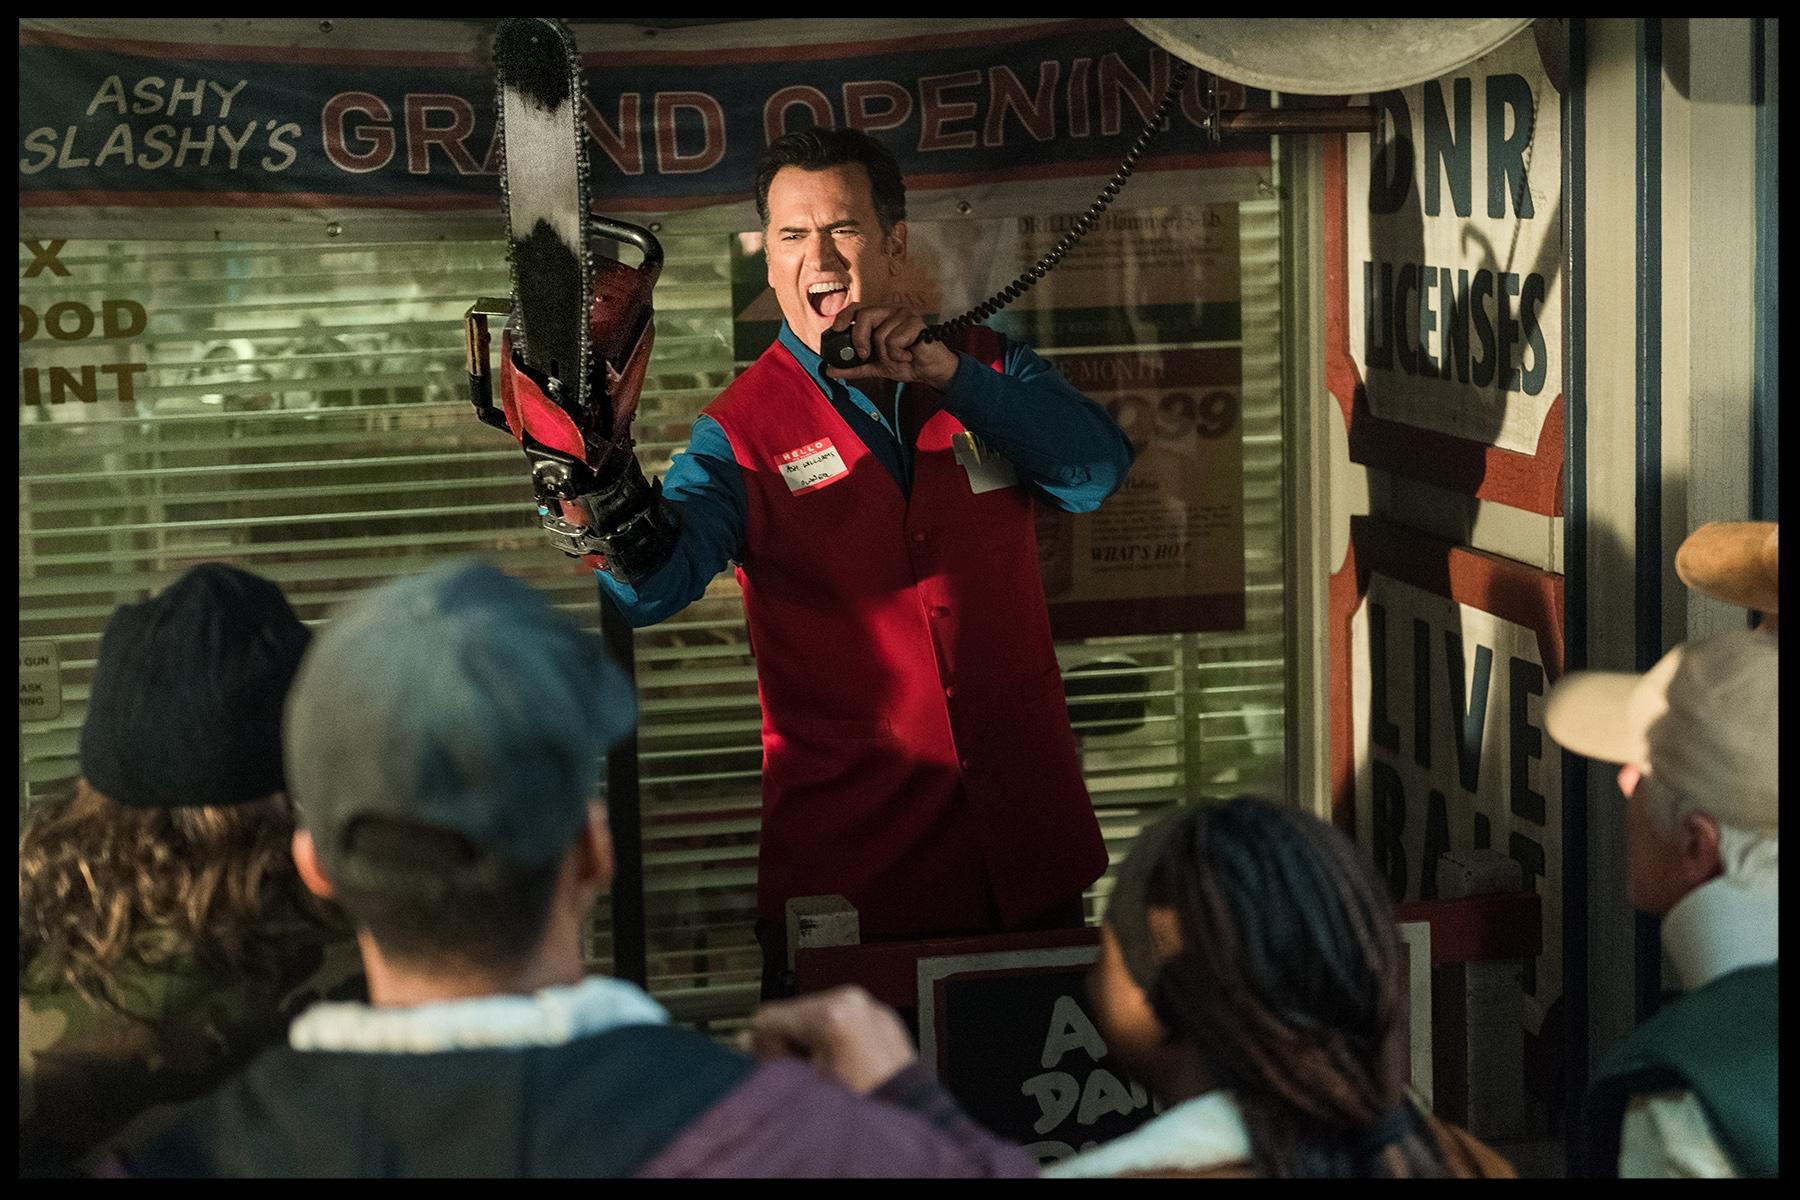 Bruce Campbell as Ash, AVED Season 3